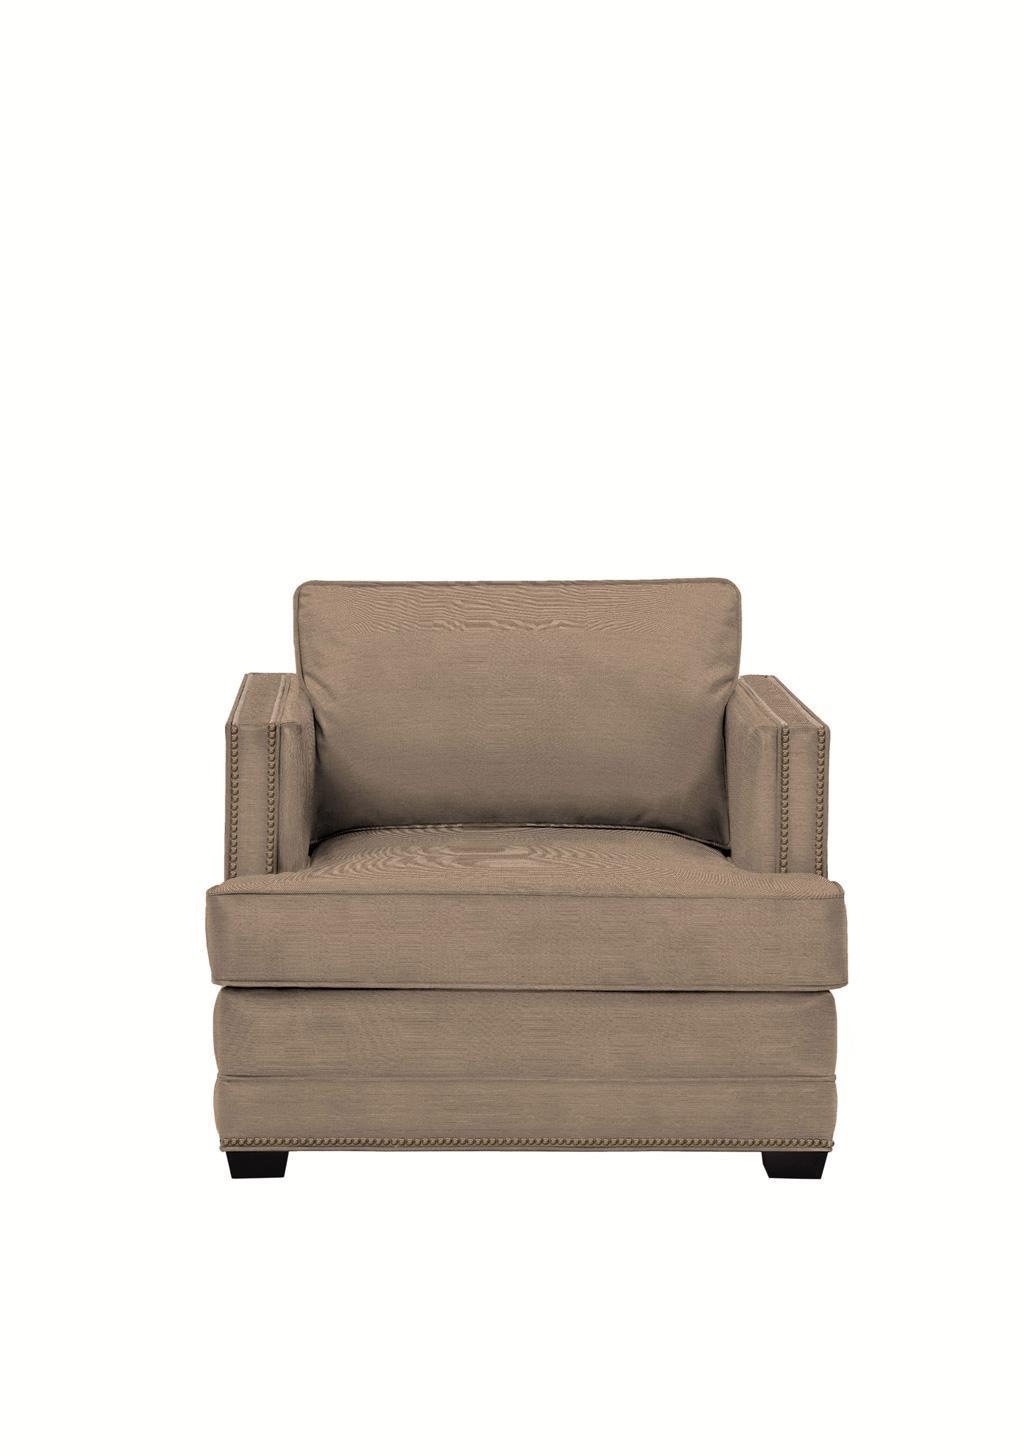 Harbor House DAKOTA单人沙发10186505011018650501